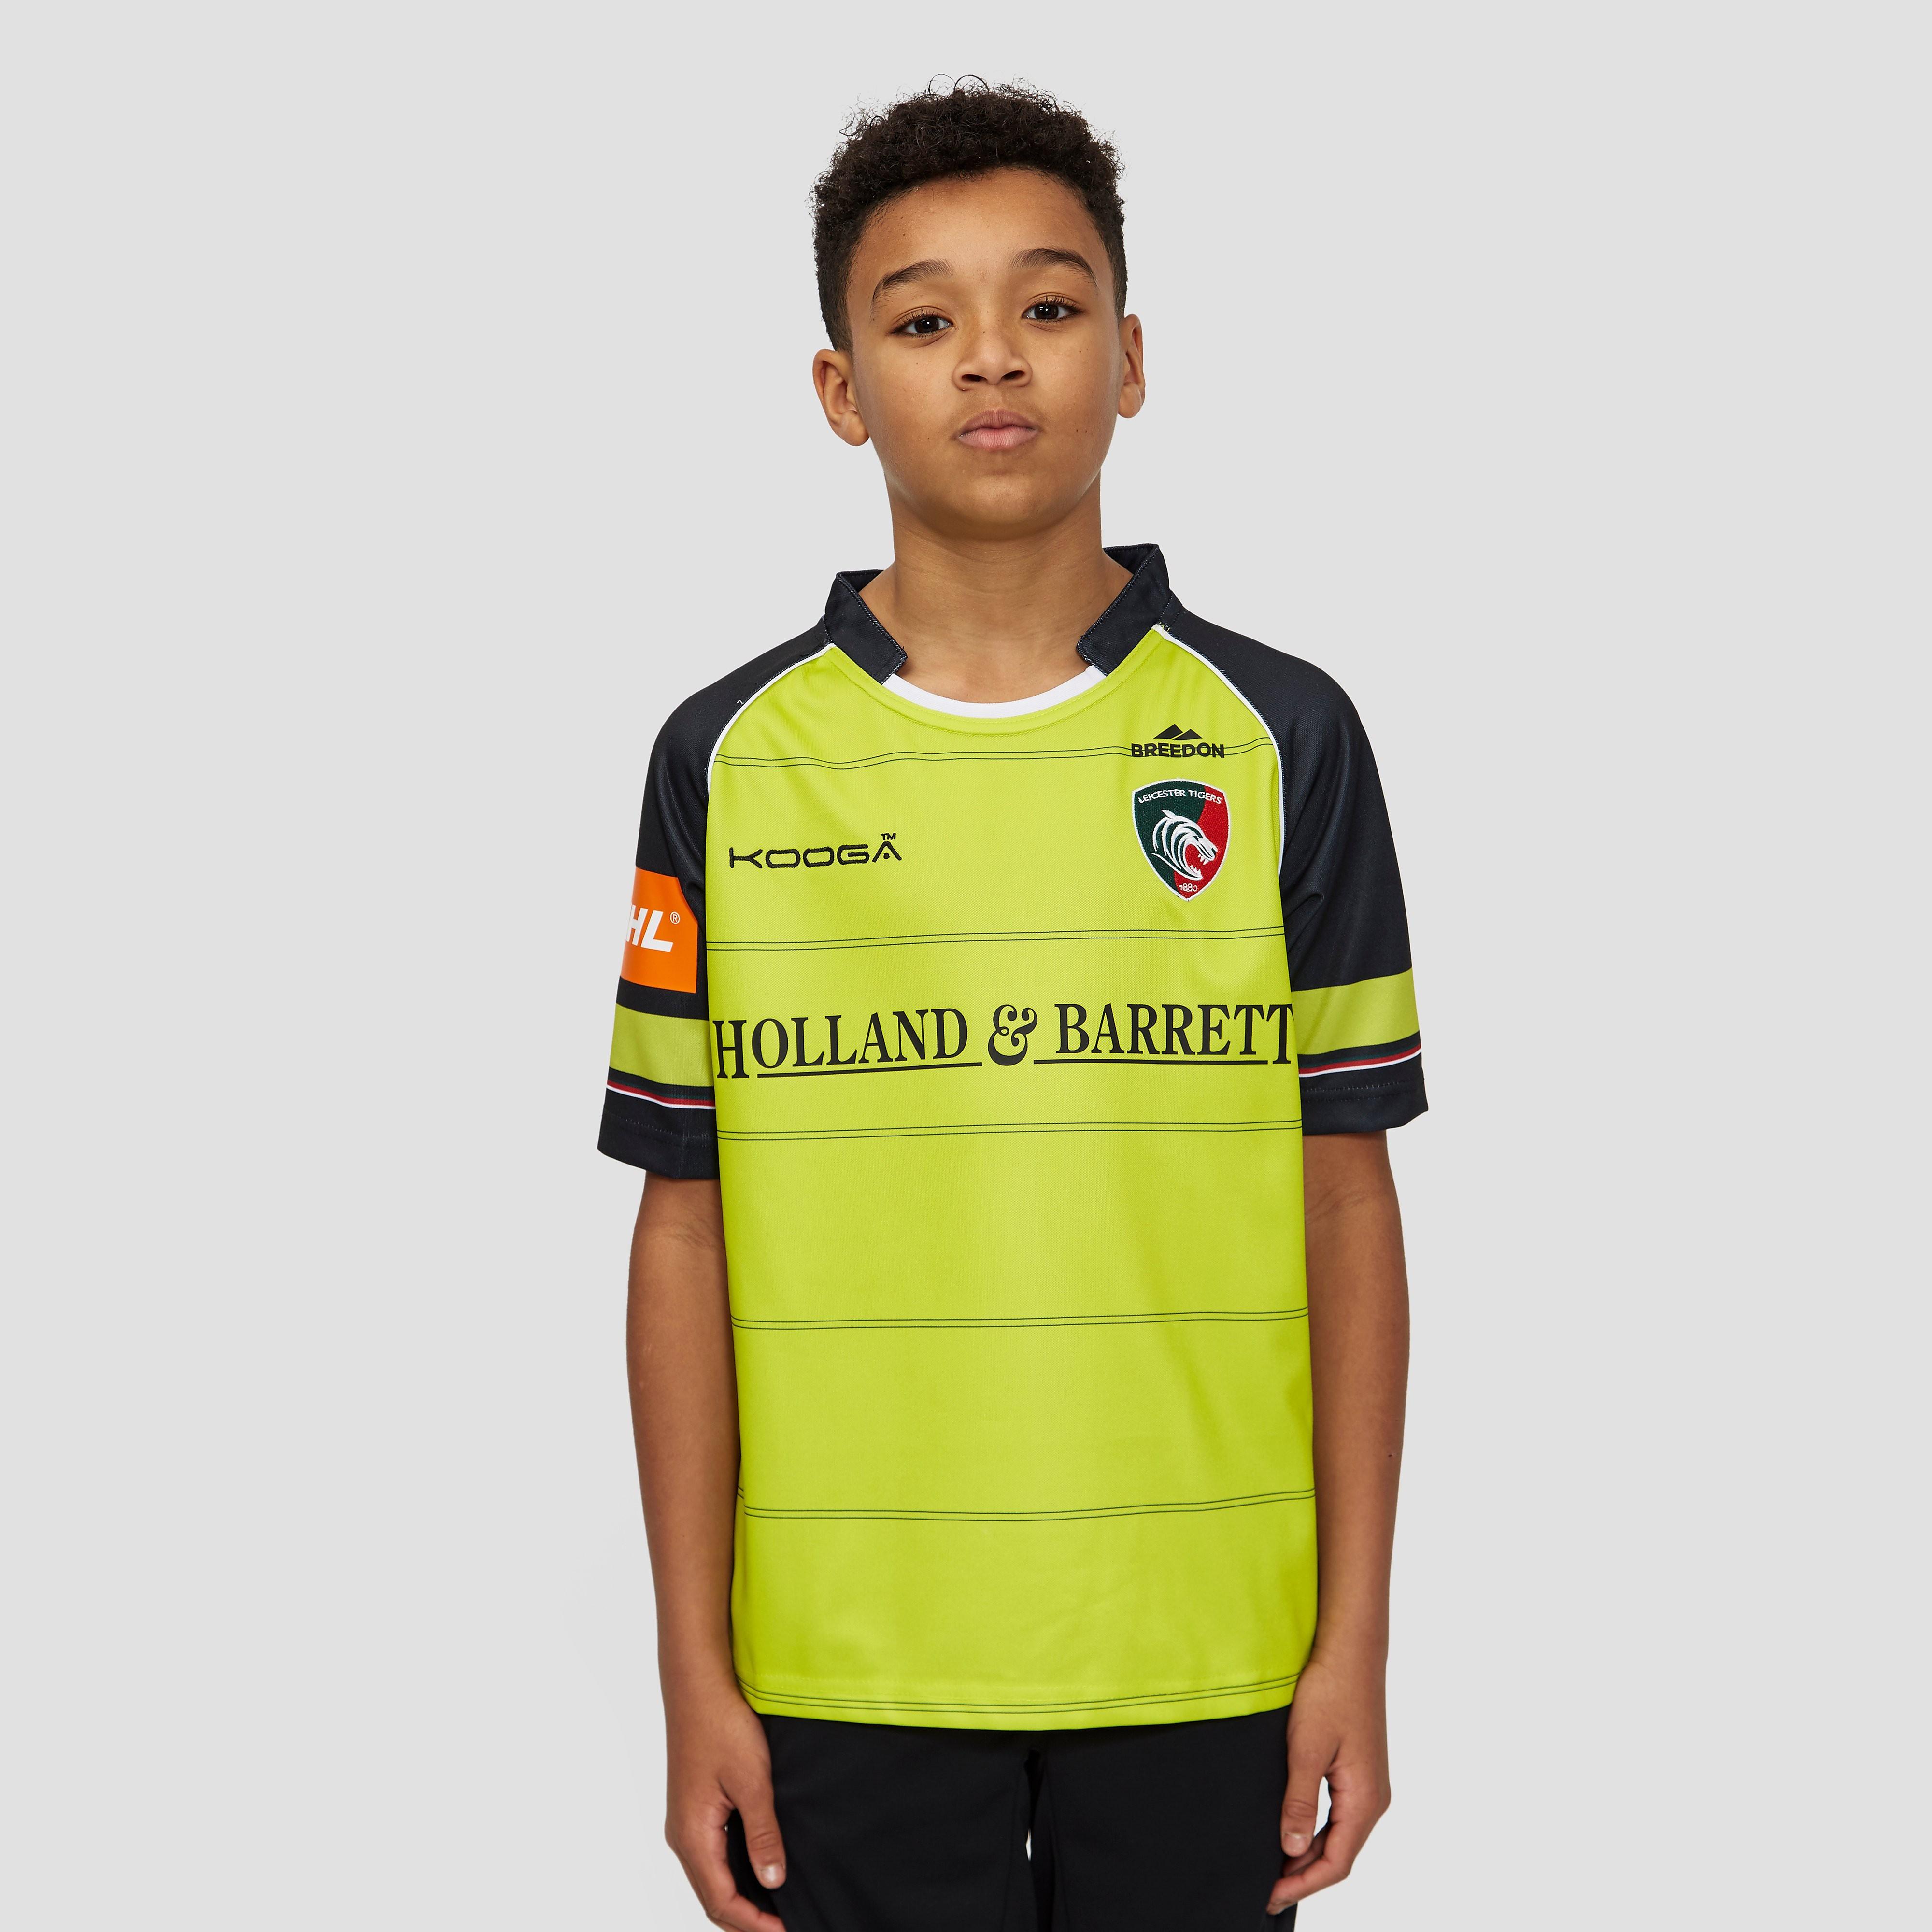 KooGa Leicester Tigers 2016/17 Junior Alternate Replica Rugby Shirt